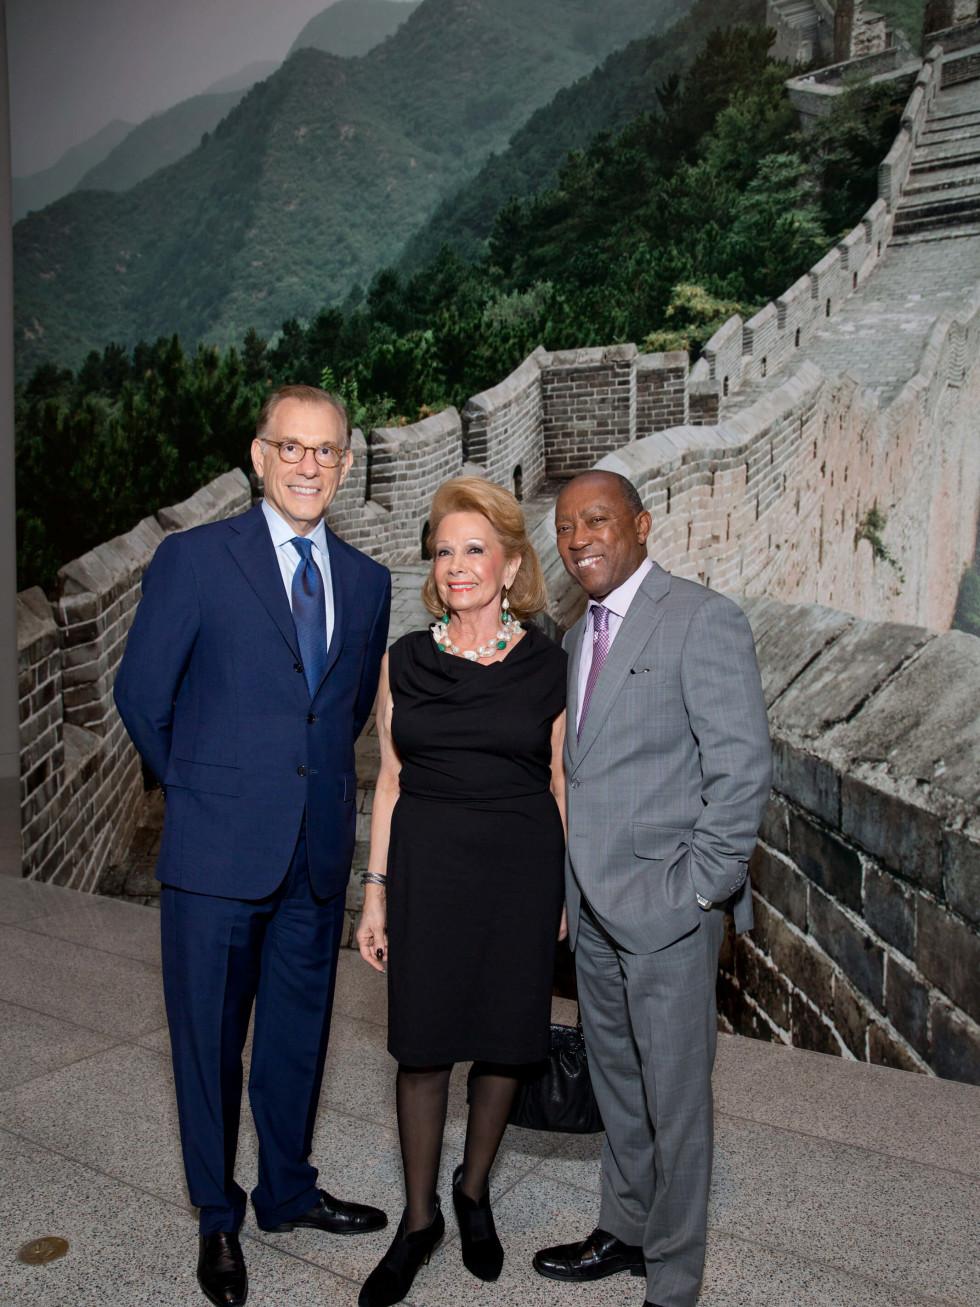 MFAH Emperors Treasures dinner, Gary Tinterow, Philamena Baird, Mayor Sylvester Turner